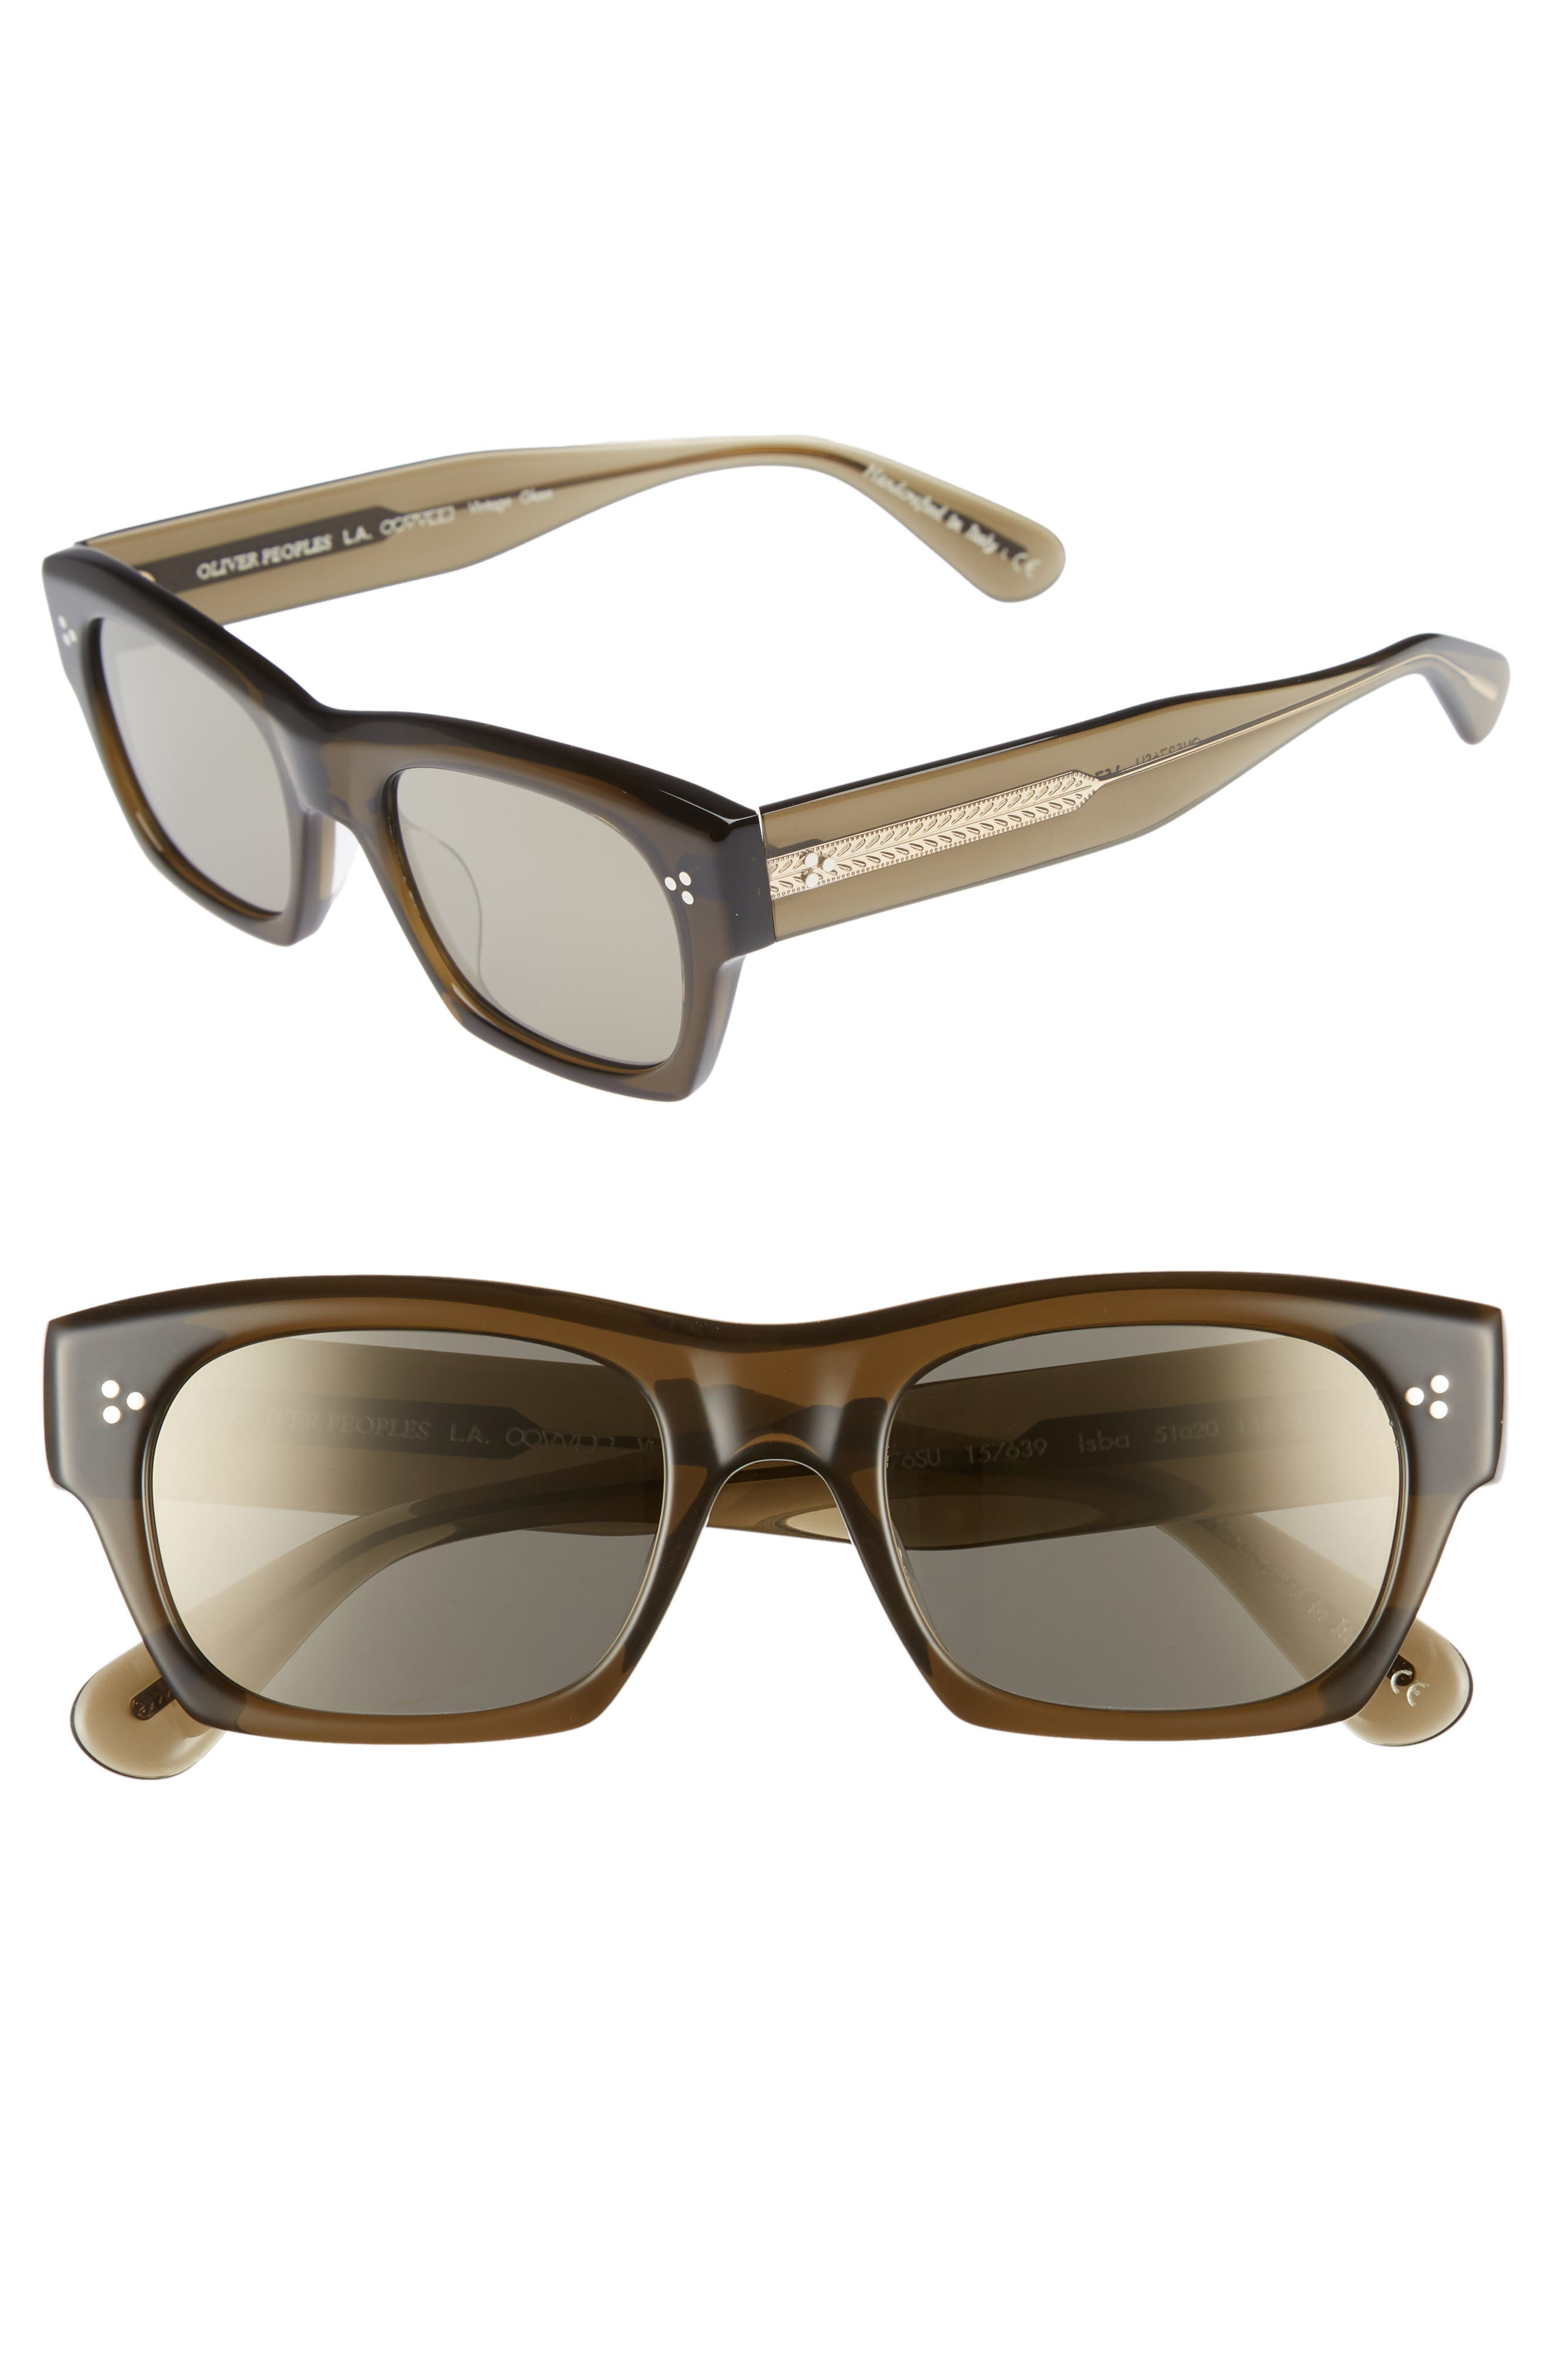 8e8a94c3086 Men s Oliver Peoples Isba 51Mm Sunglasses - Dark Military